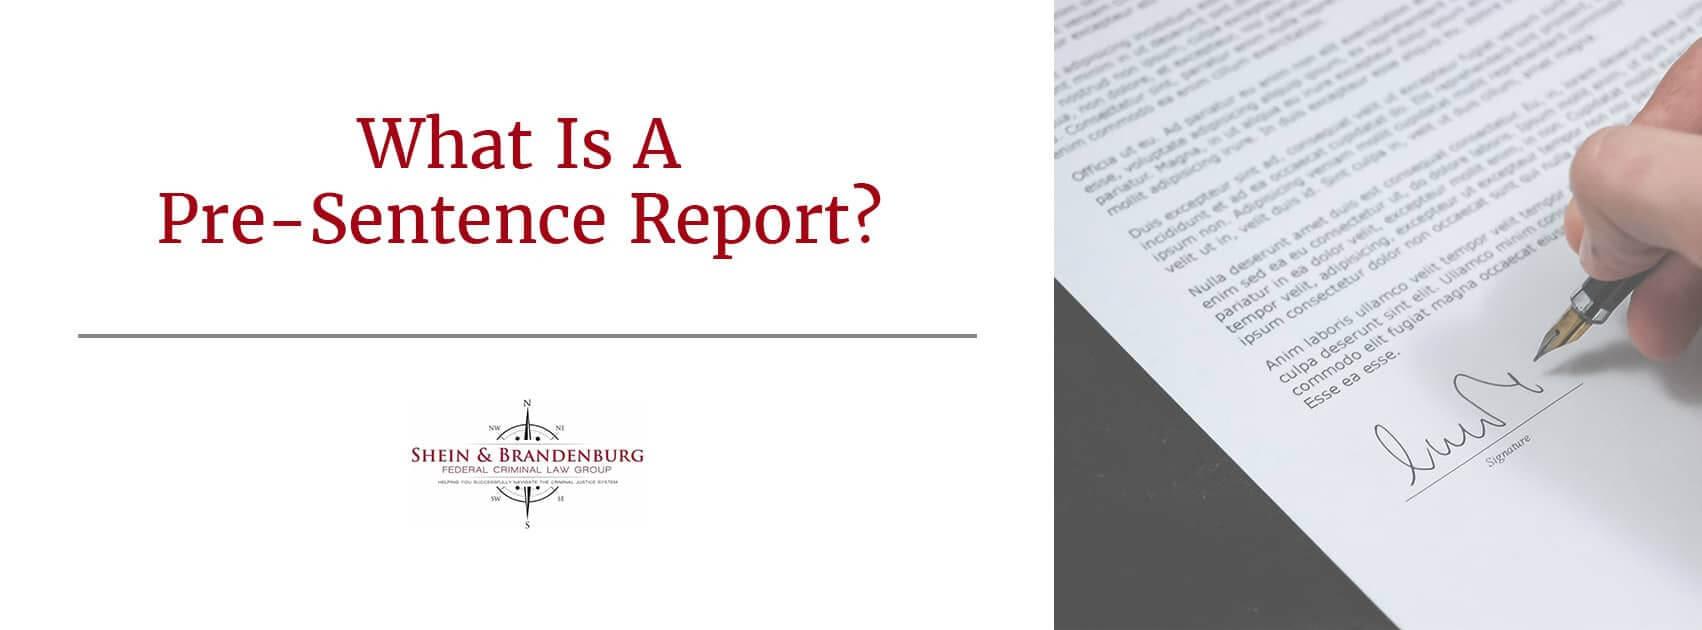 Presentence Investigation Report Template Example Federal inside Presentence Investigation Report Template